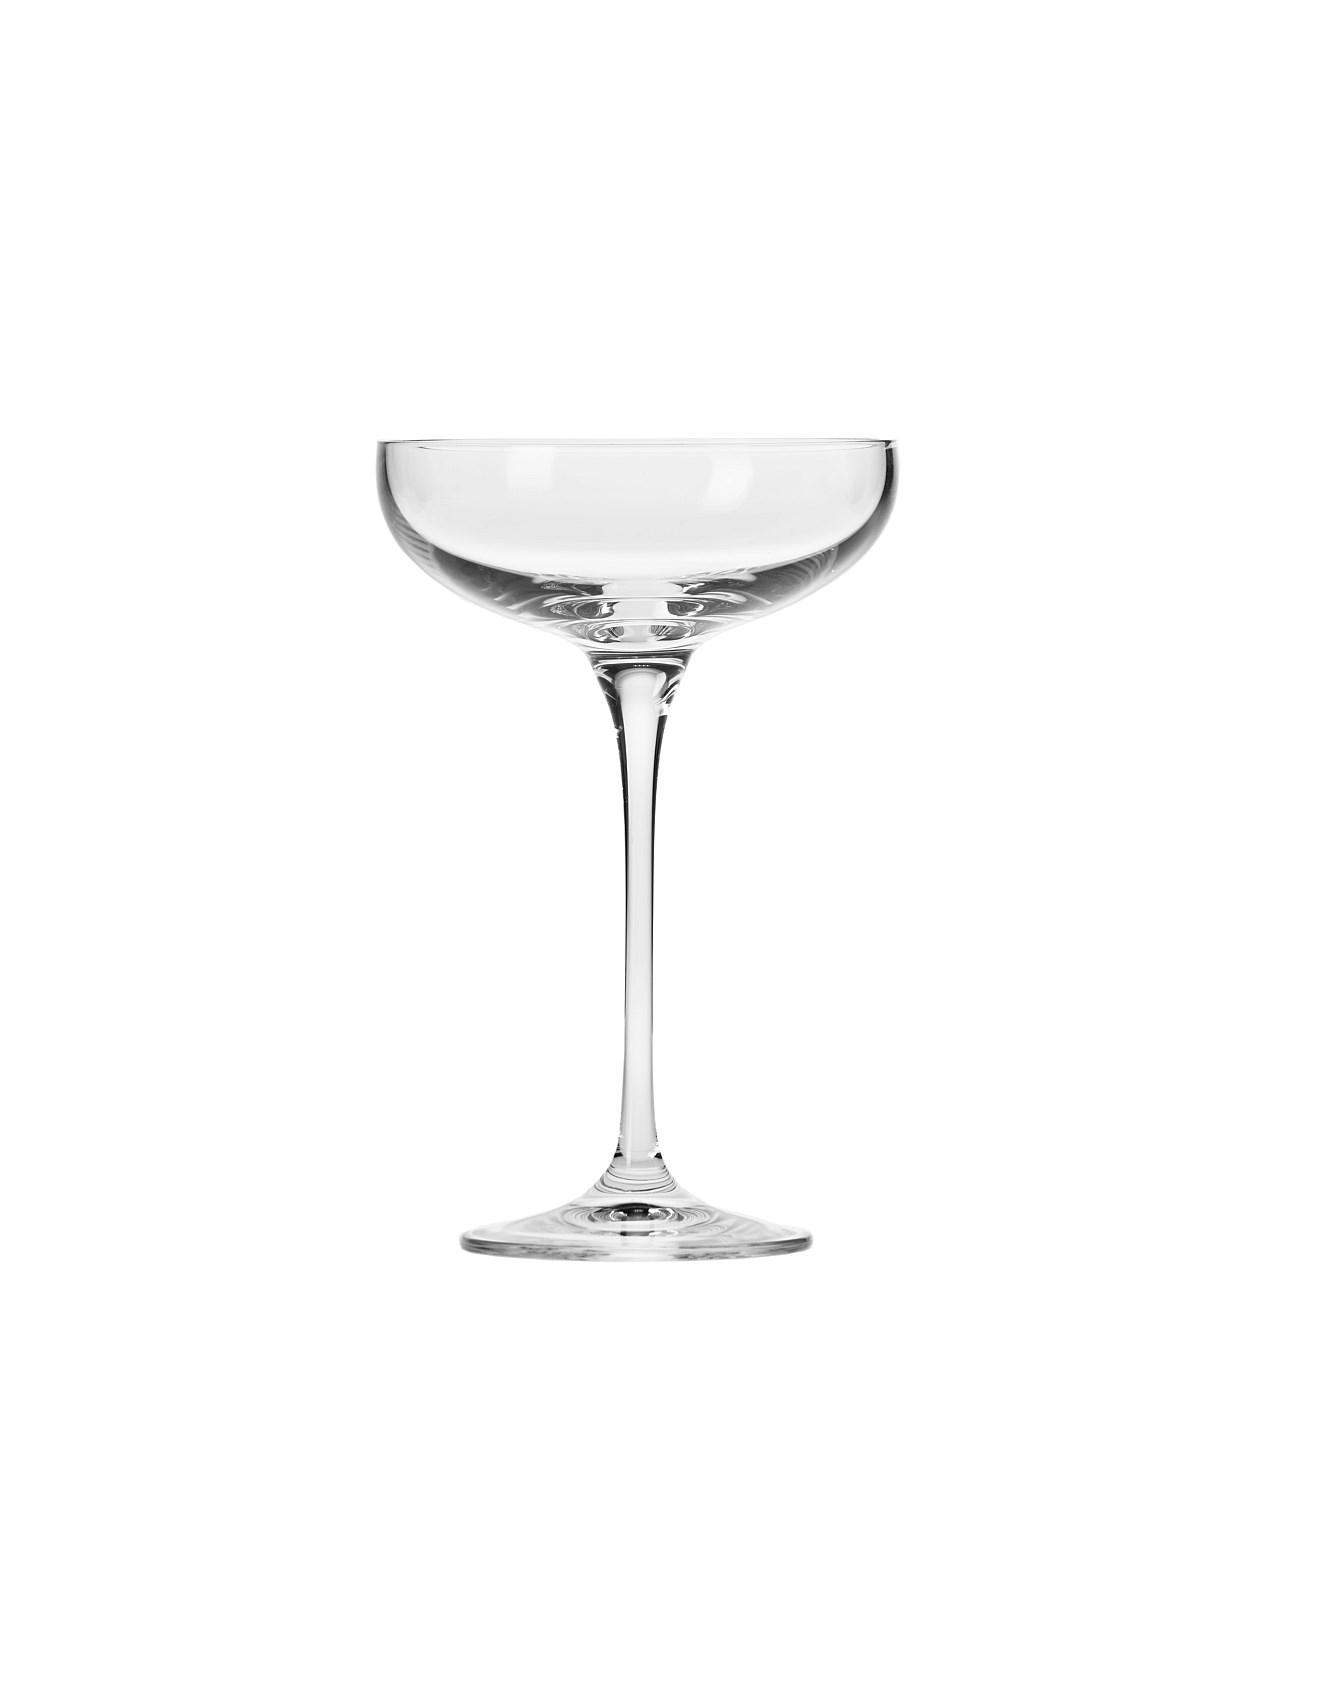 Krosno Buy Krosno Glasses Vases More David Jones Harmony Champagne Coupe Set Of 6